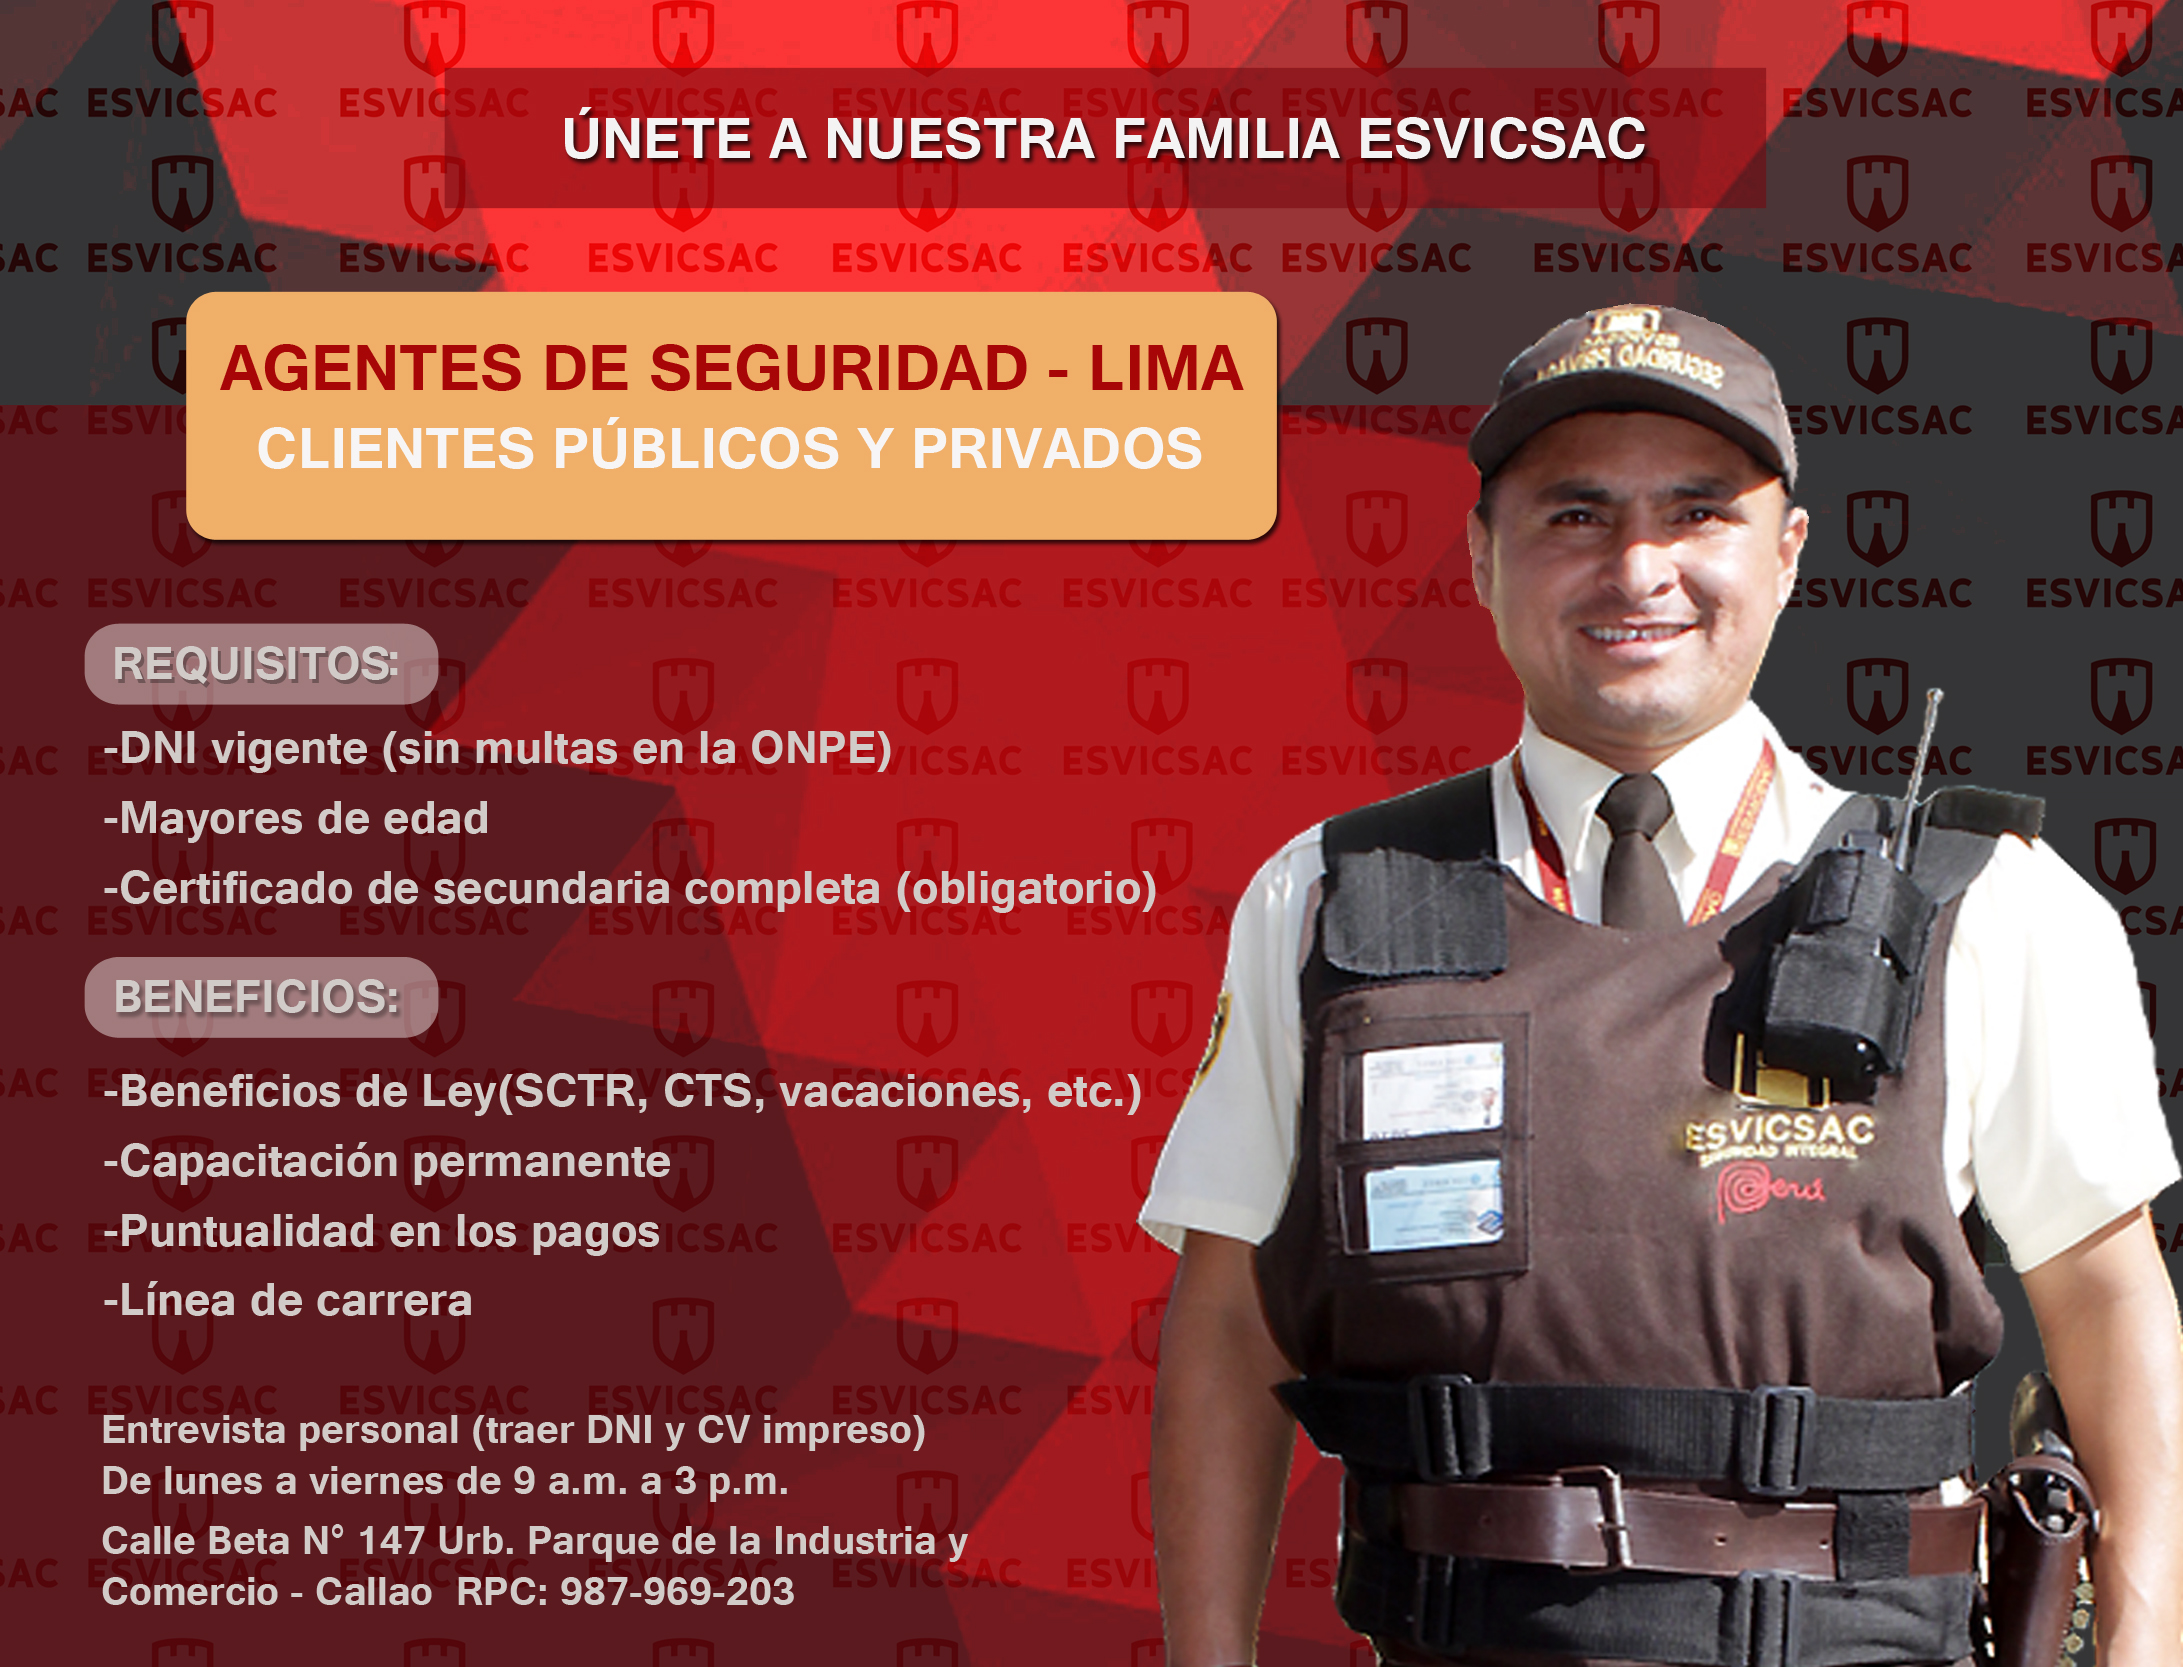 Convocatoria De Personal Lima Esvicsac